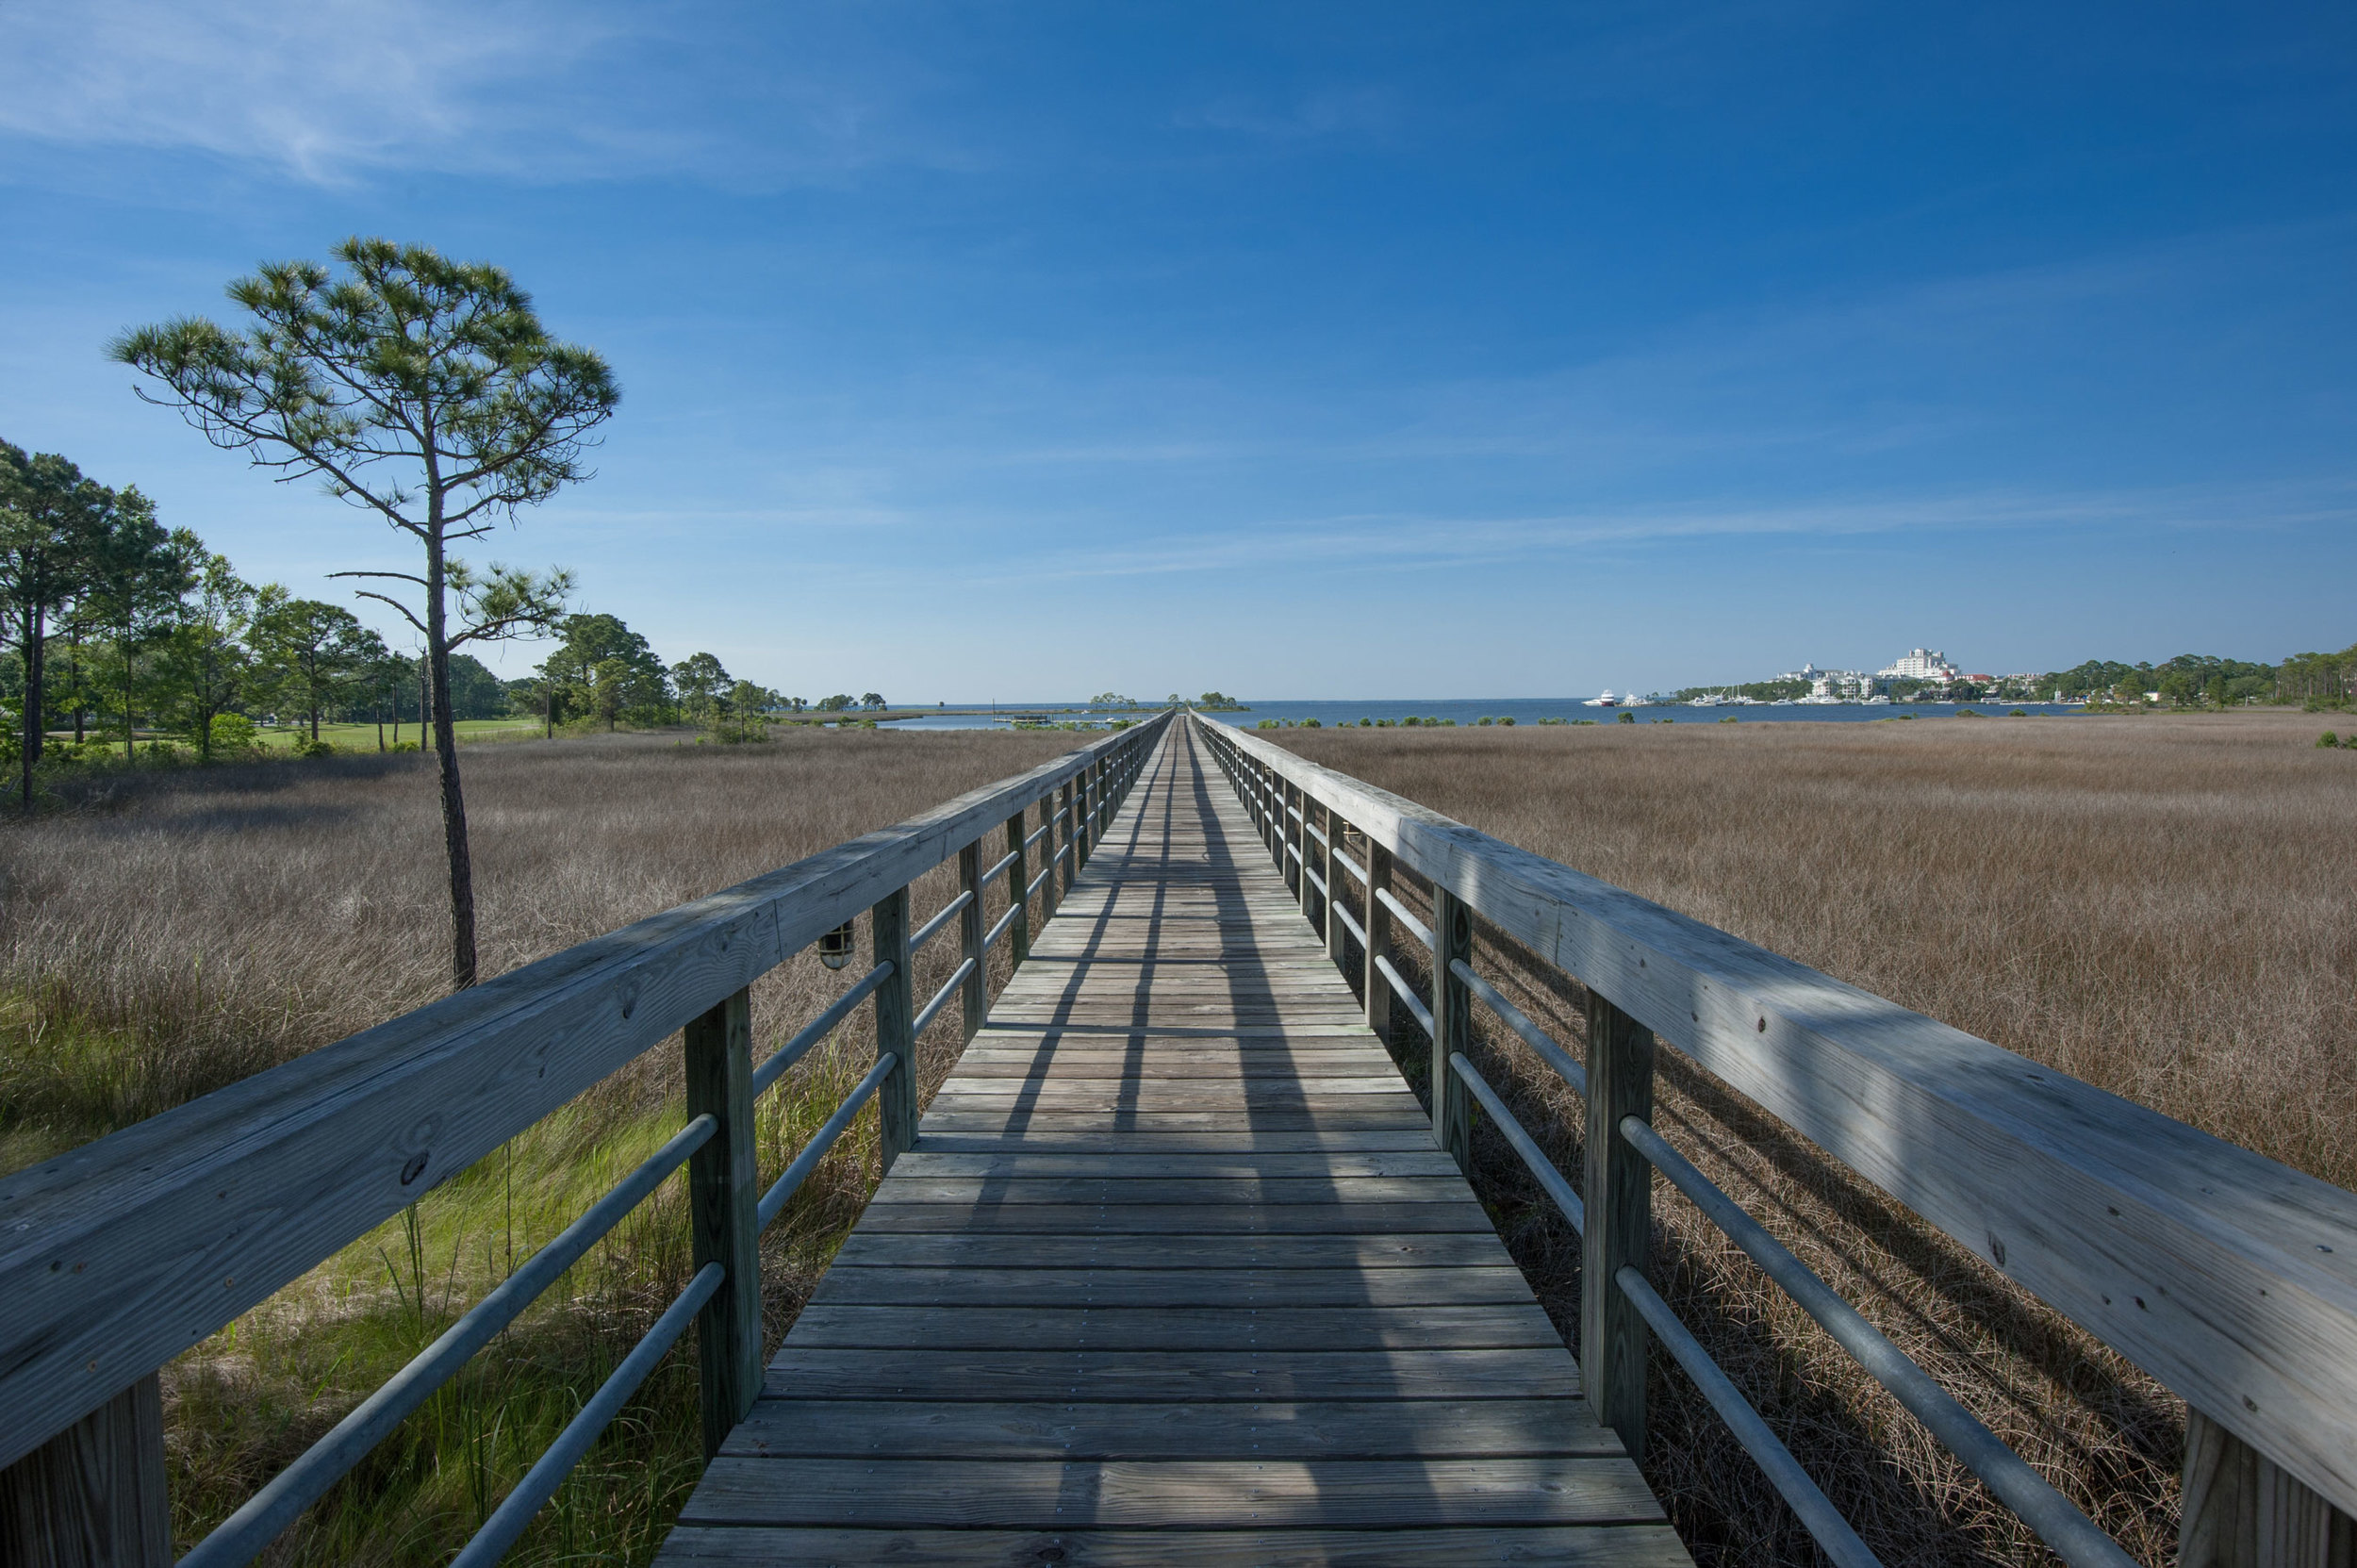 Boardwalk Walk Way in Sandestin Resort